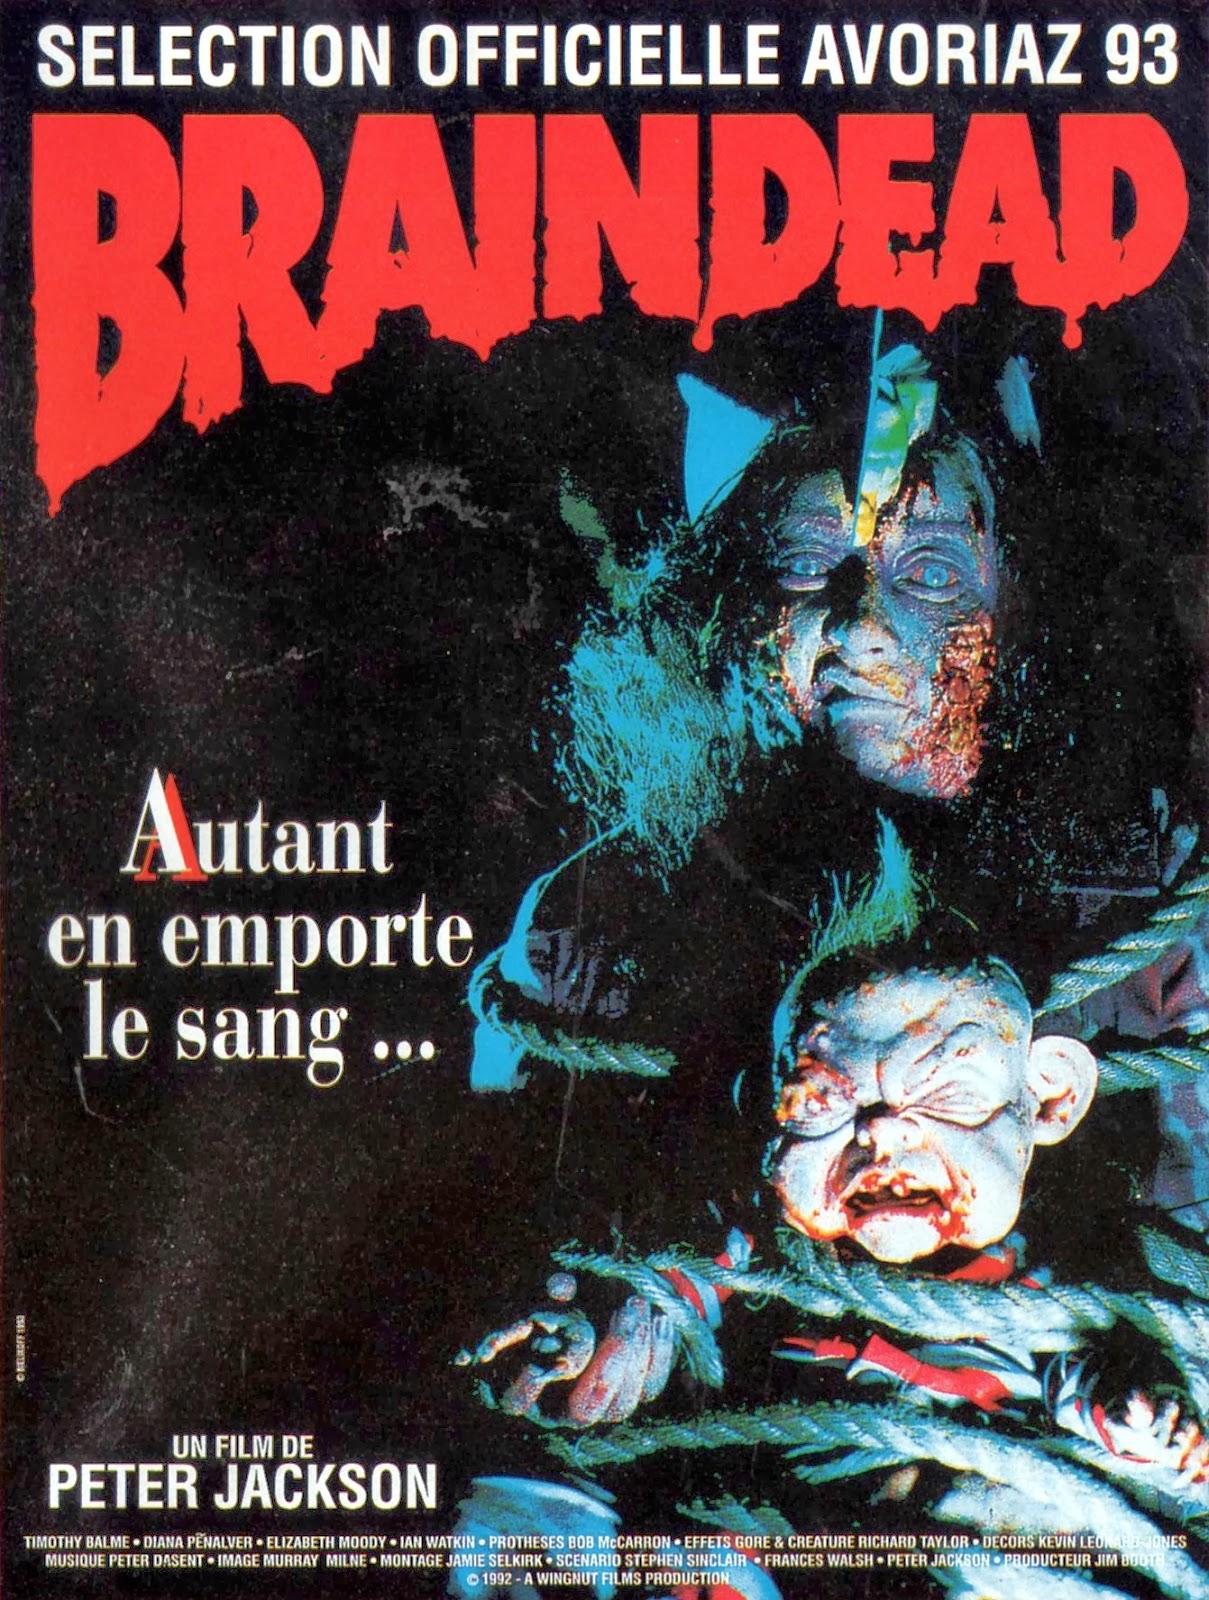 http://1.bp.blogspot.com/-j0DxWpqHoBg/UrUuPqfedgI/AAAAAAAAGYs/xrgng8-UqRg/s1600/BRAINDEAD+-+French+Poster.jpg